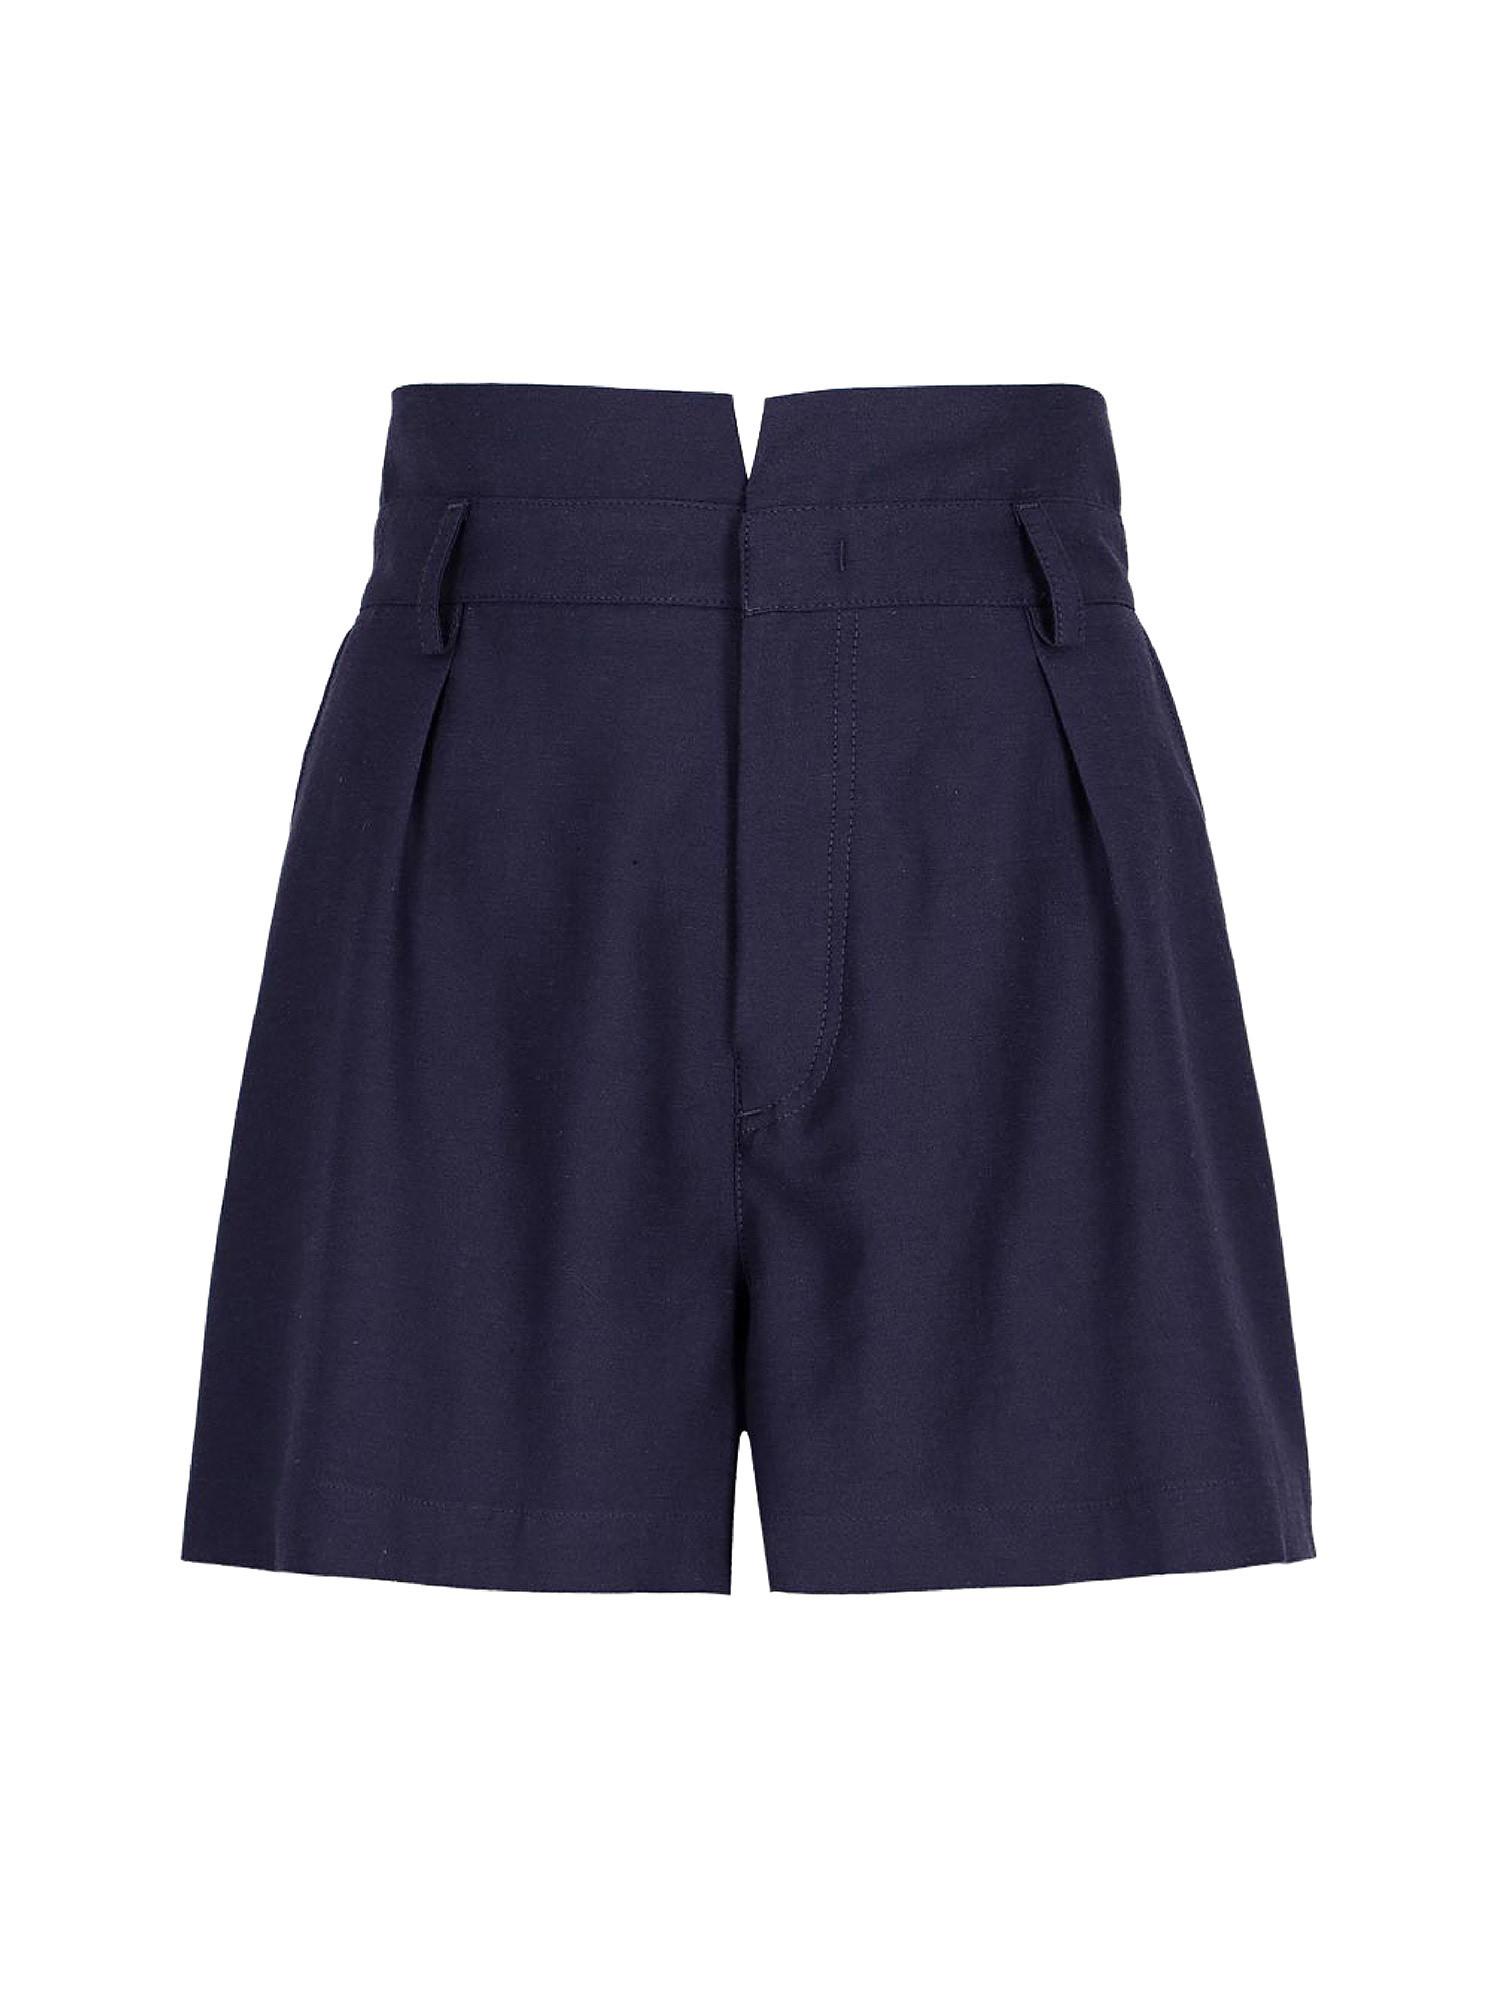 Shorts in shantung Ginger, Viola lilla, large image number 0